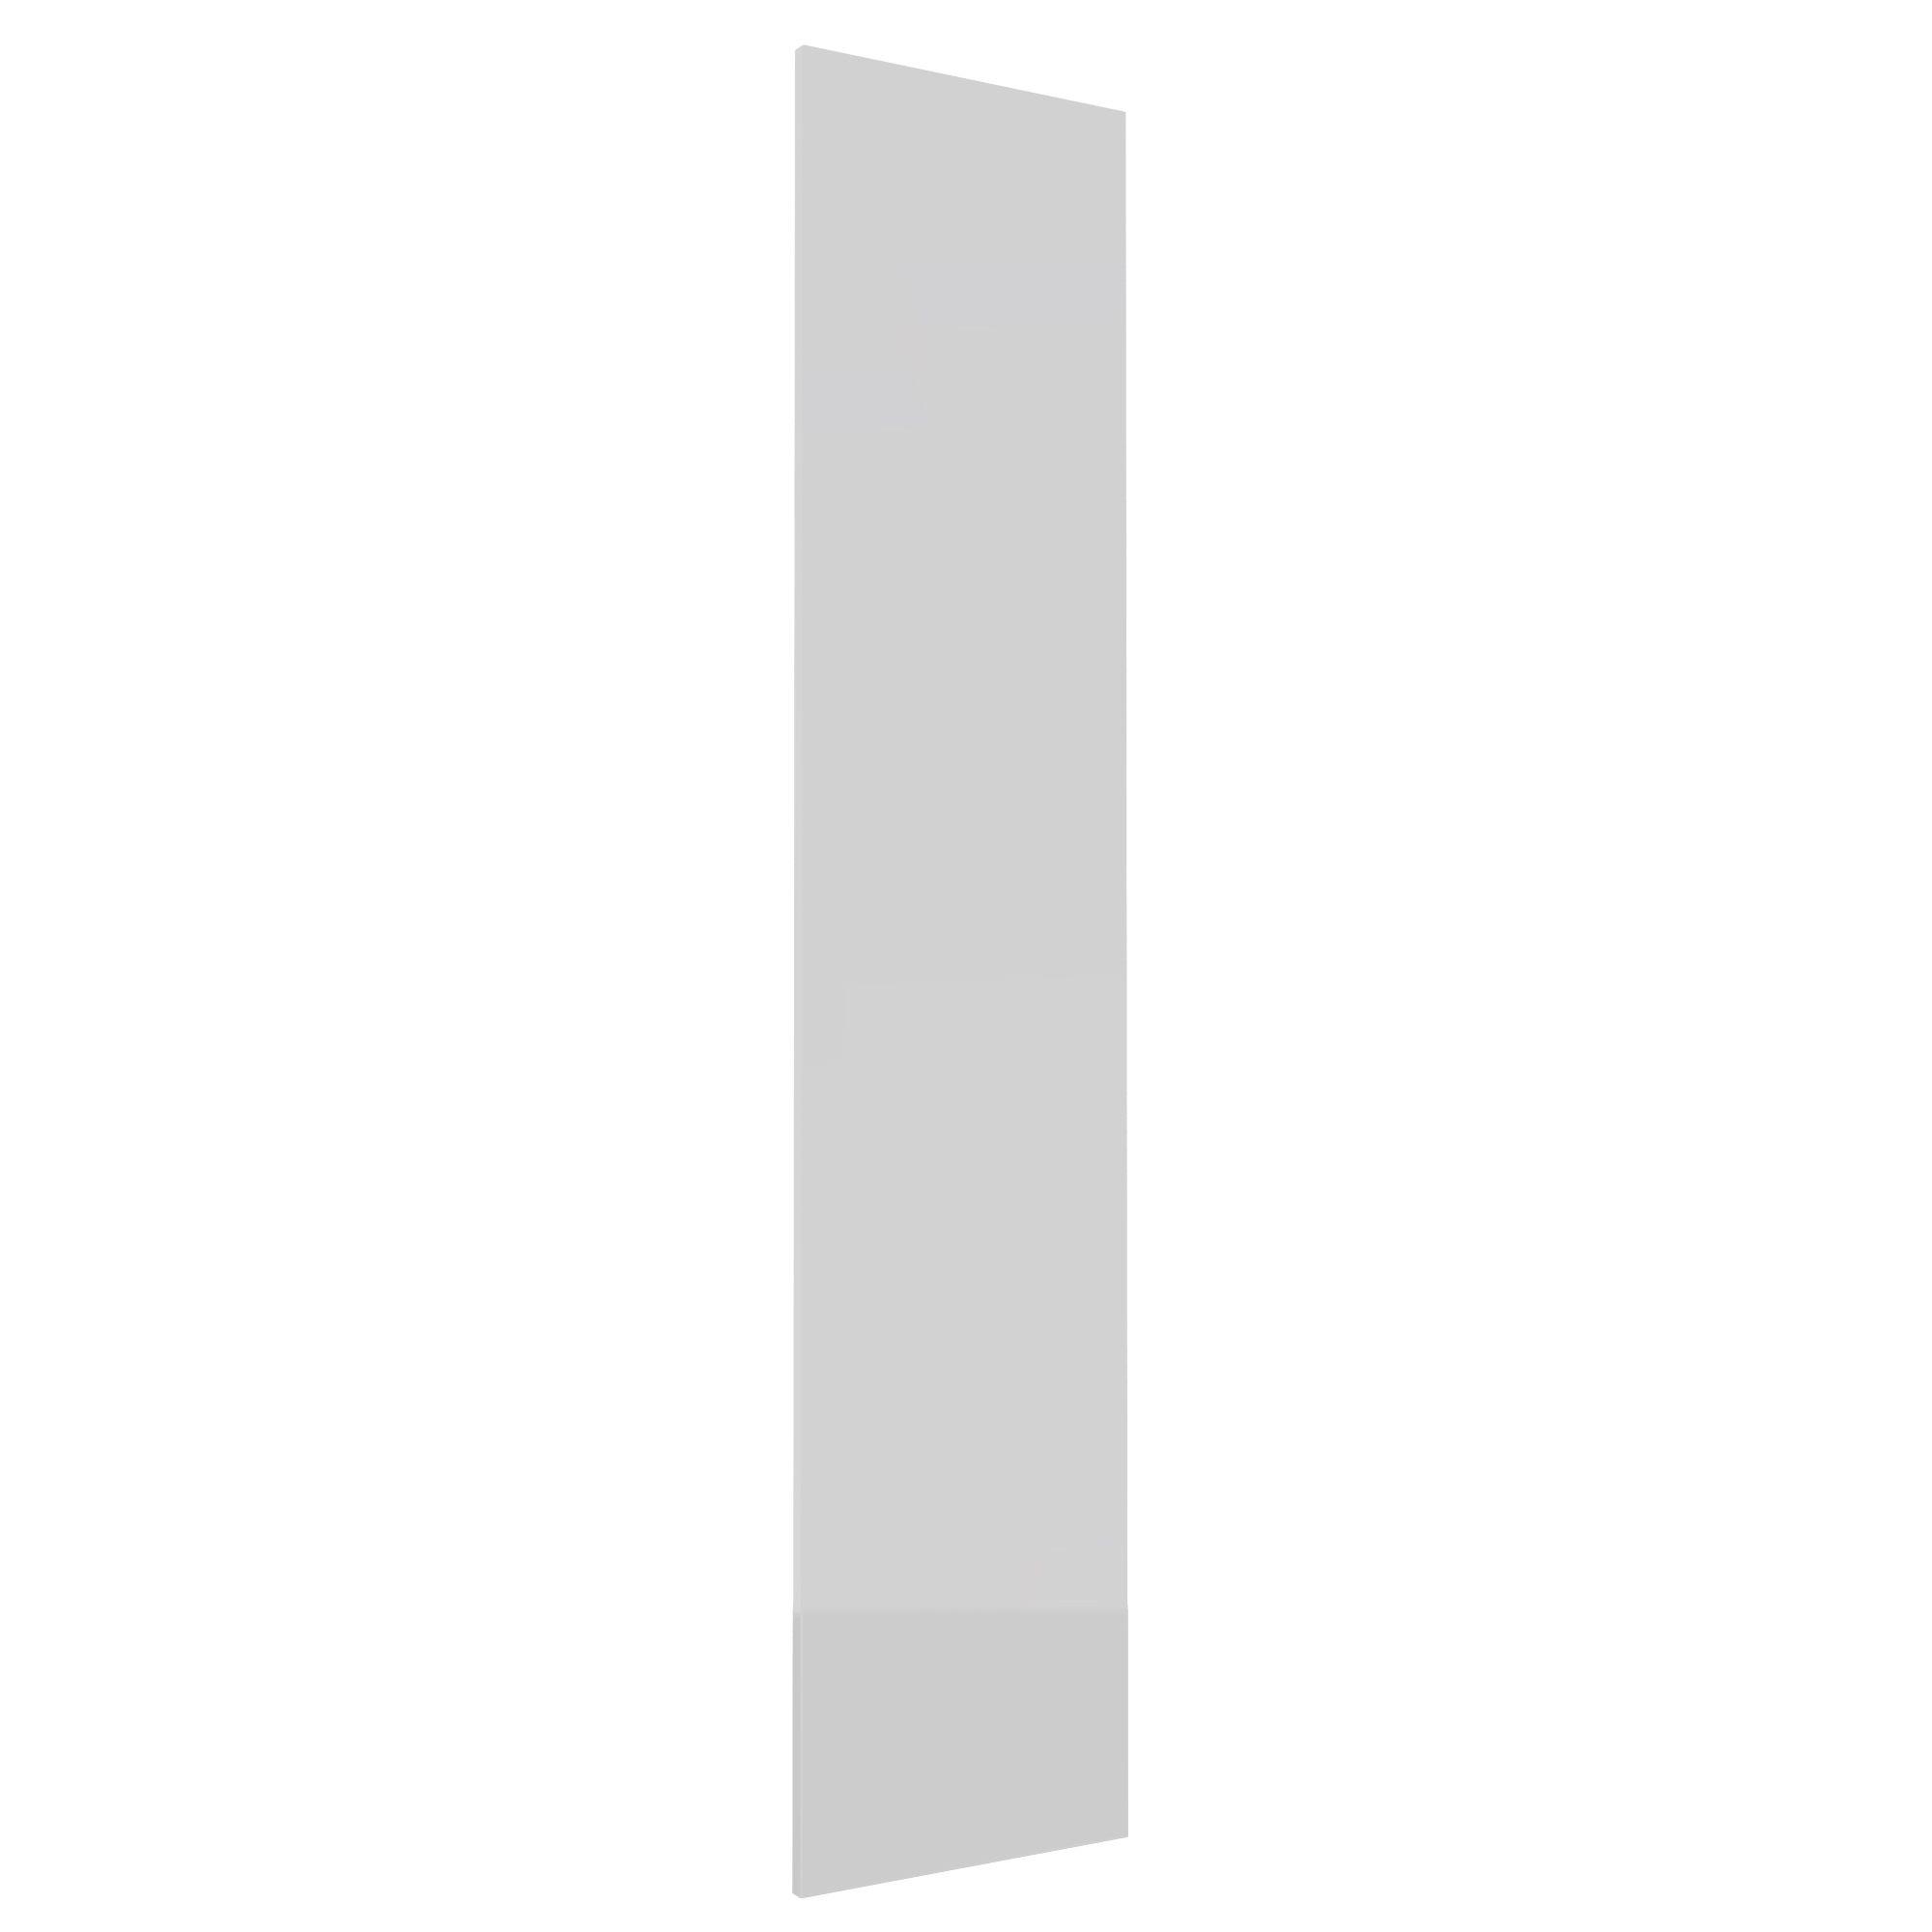 Darwin Modular White & Gloss Wardrobe Door (h)1936mm (w)372mm (d)16mm